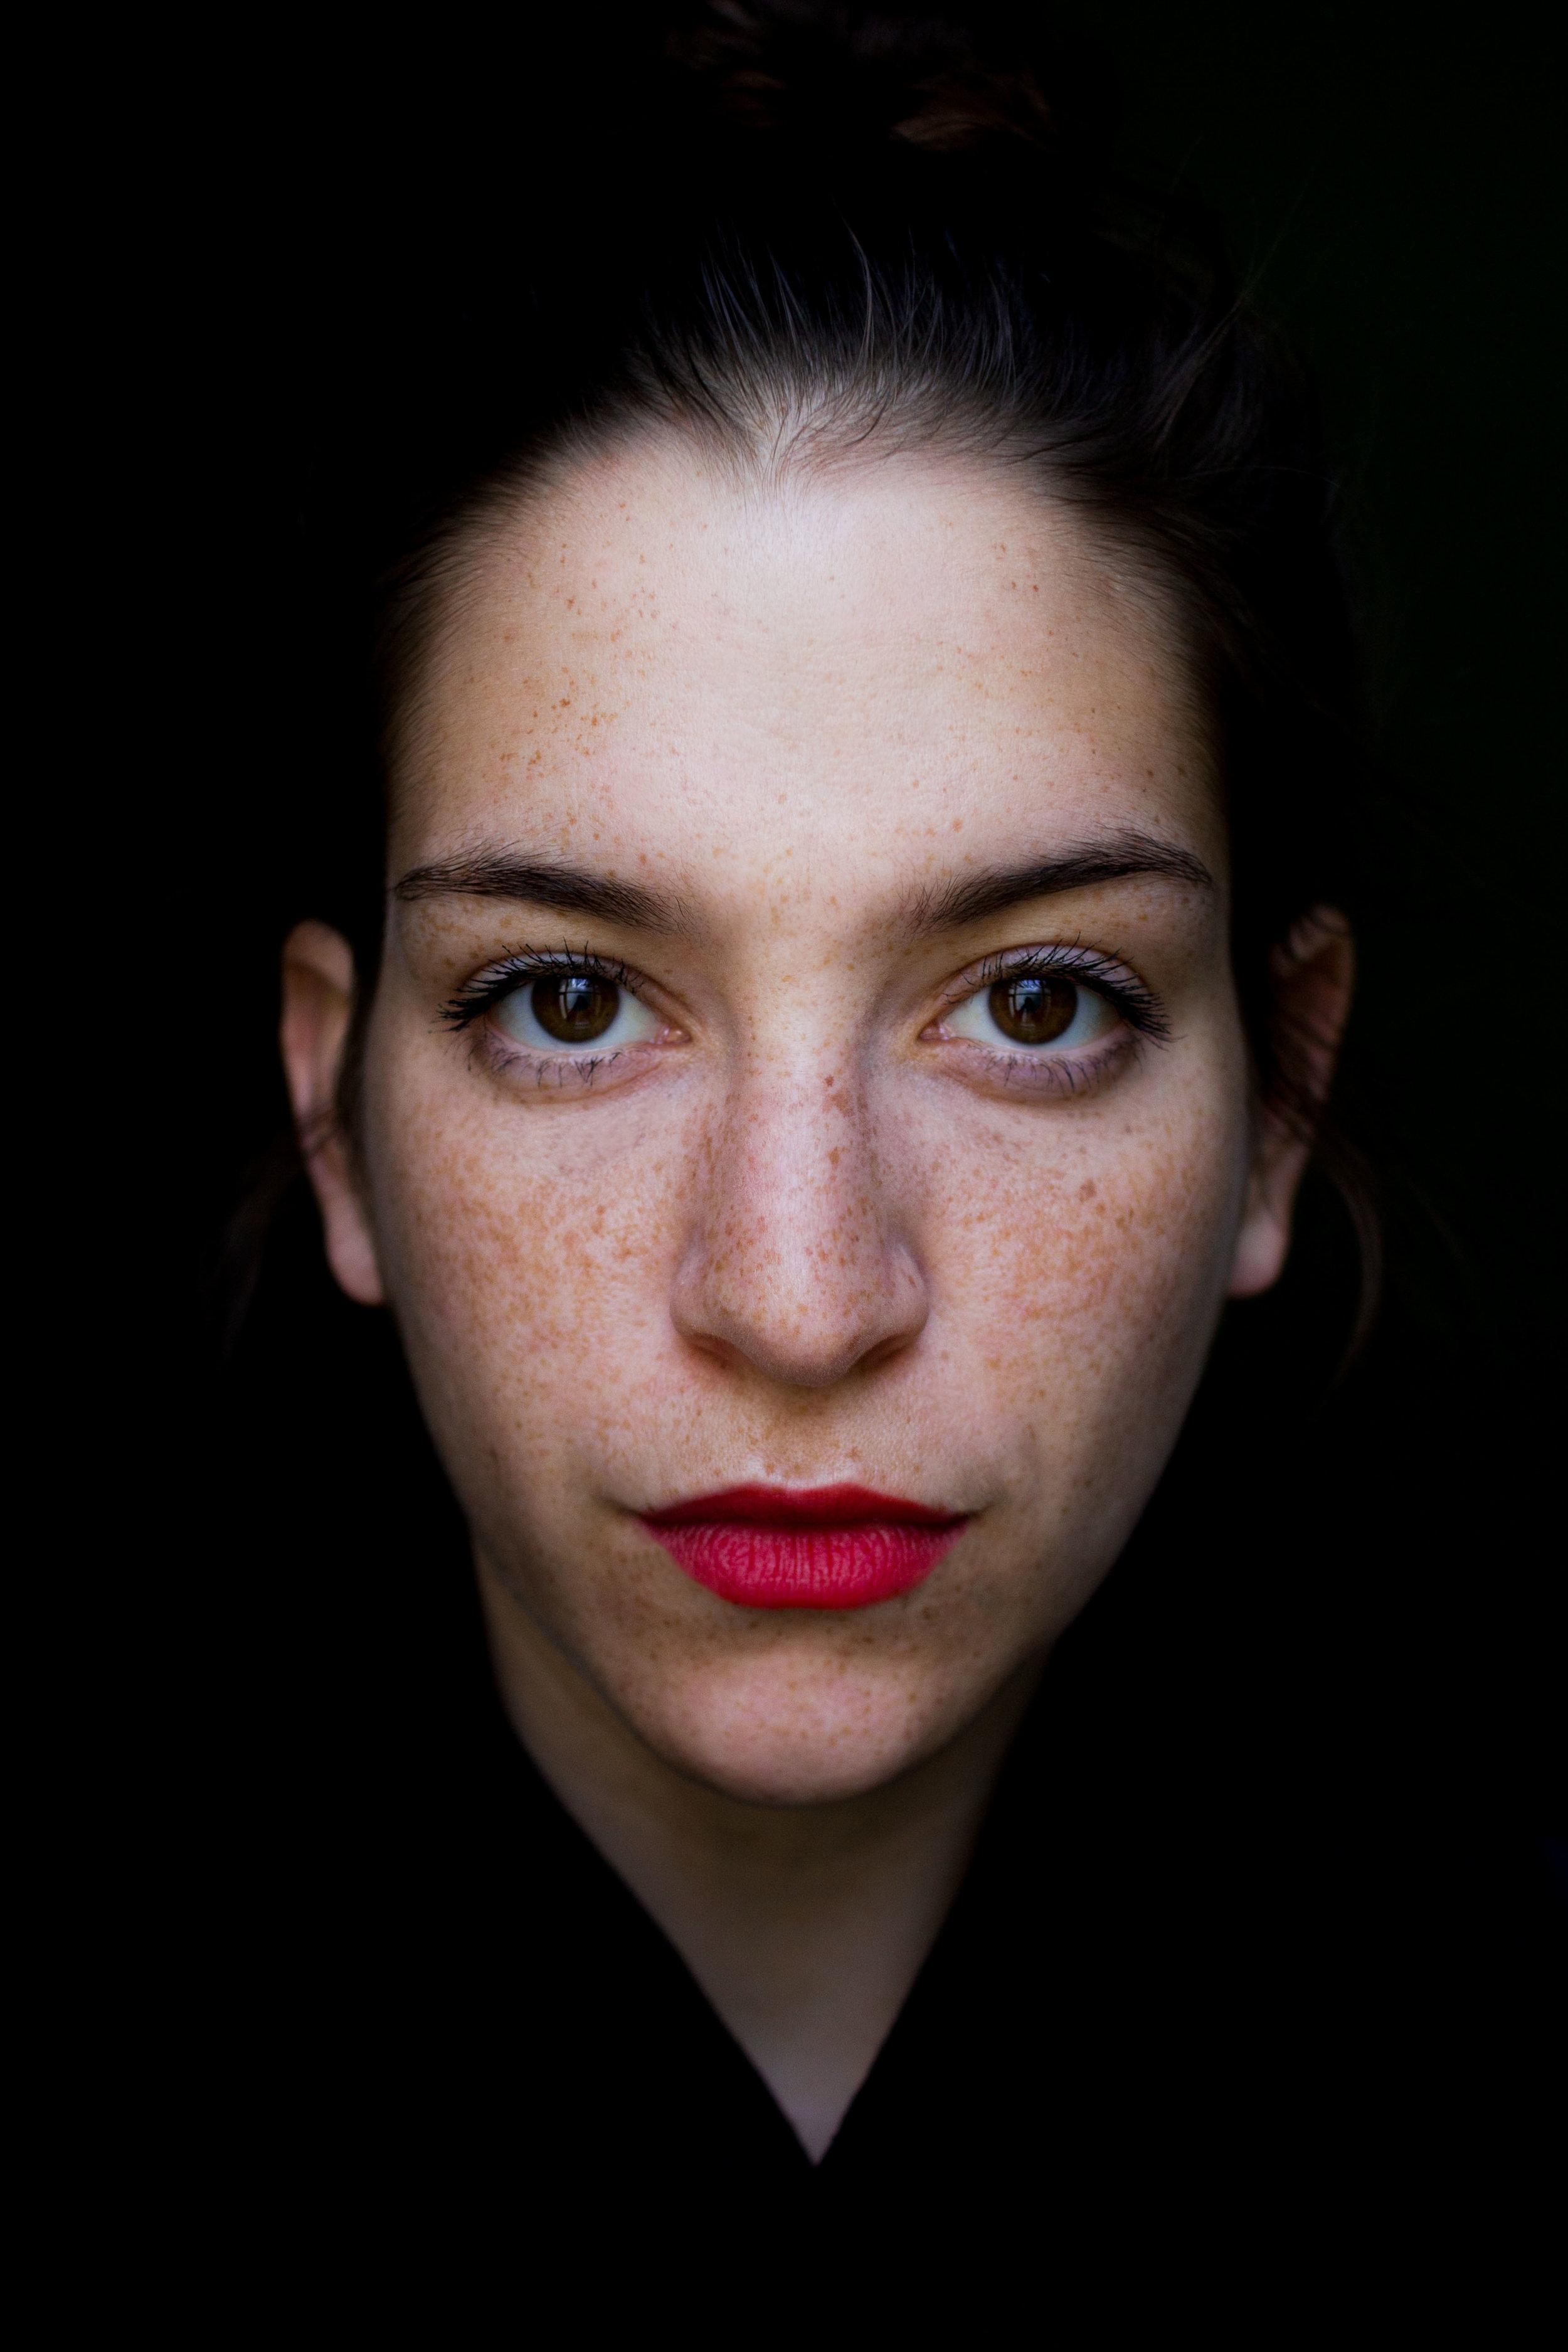 Katja-Hasenoehrl-Selbstportrait.jpg